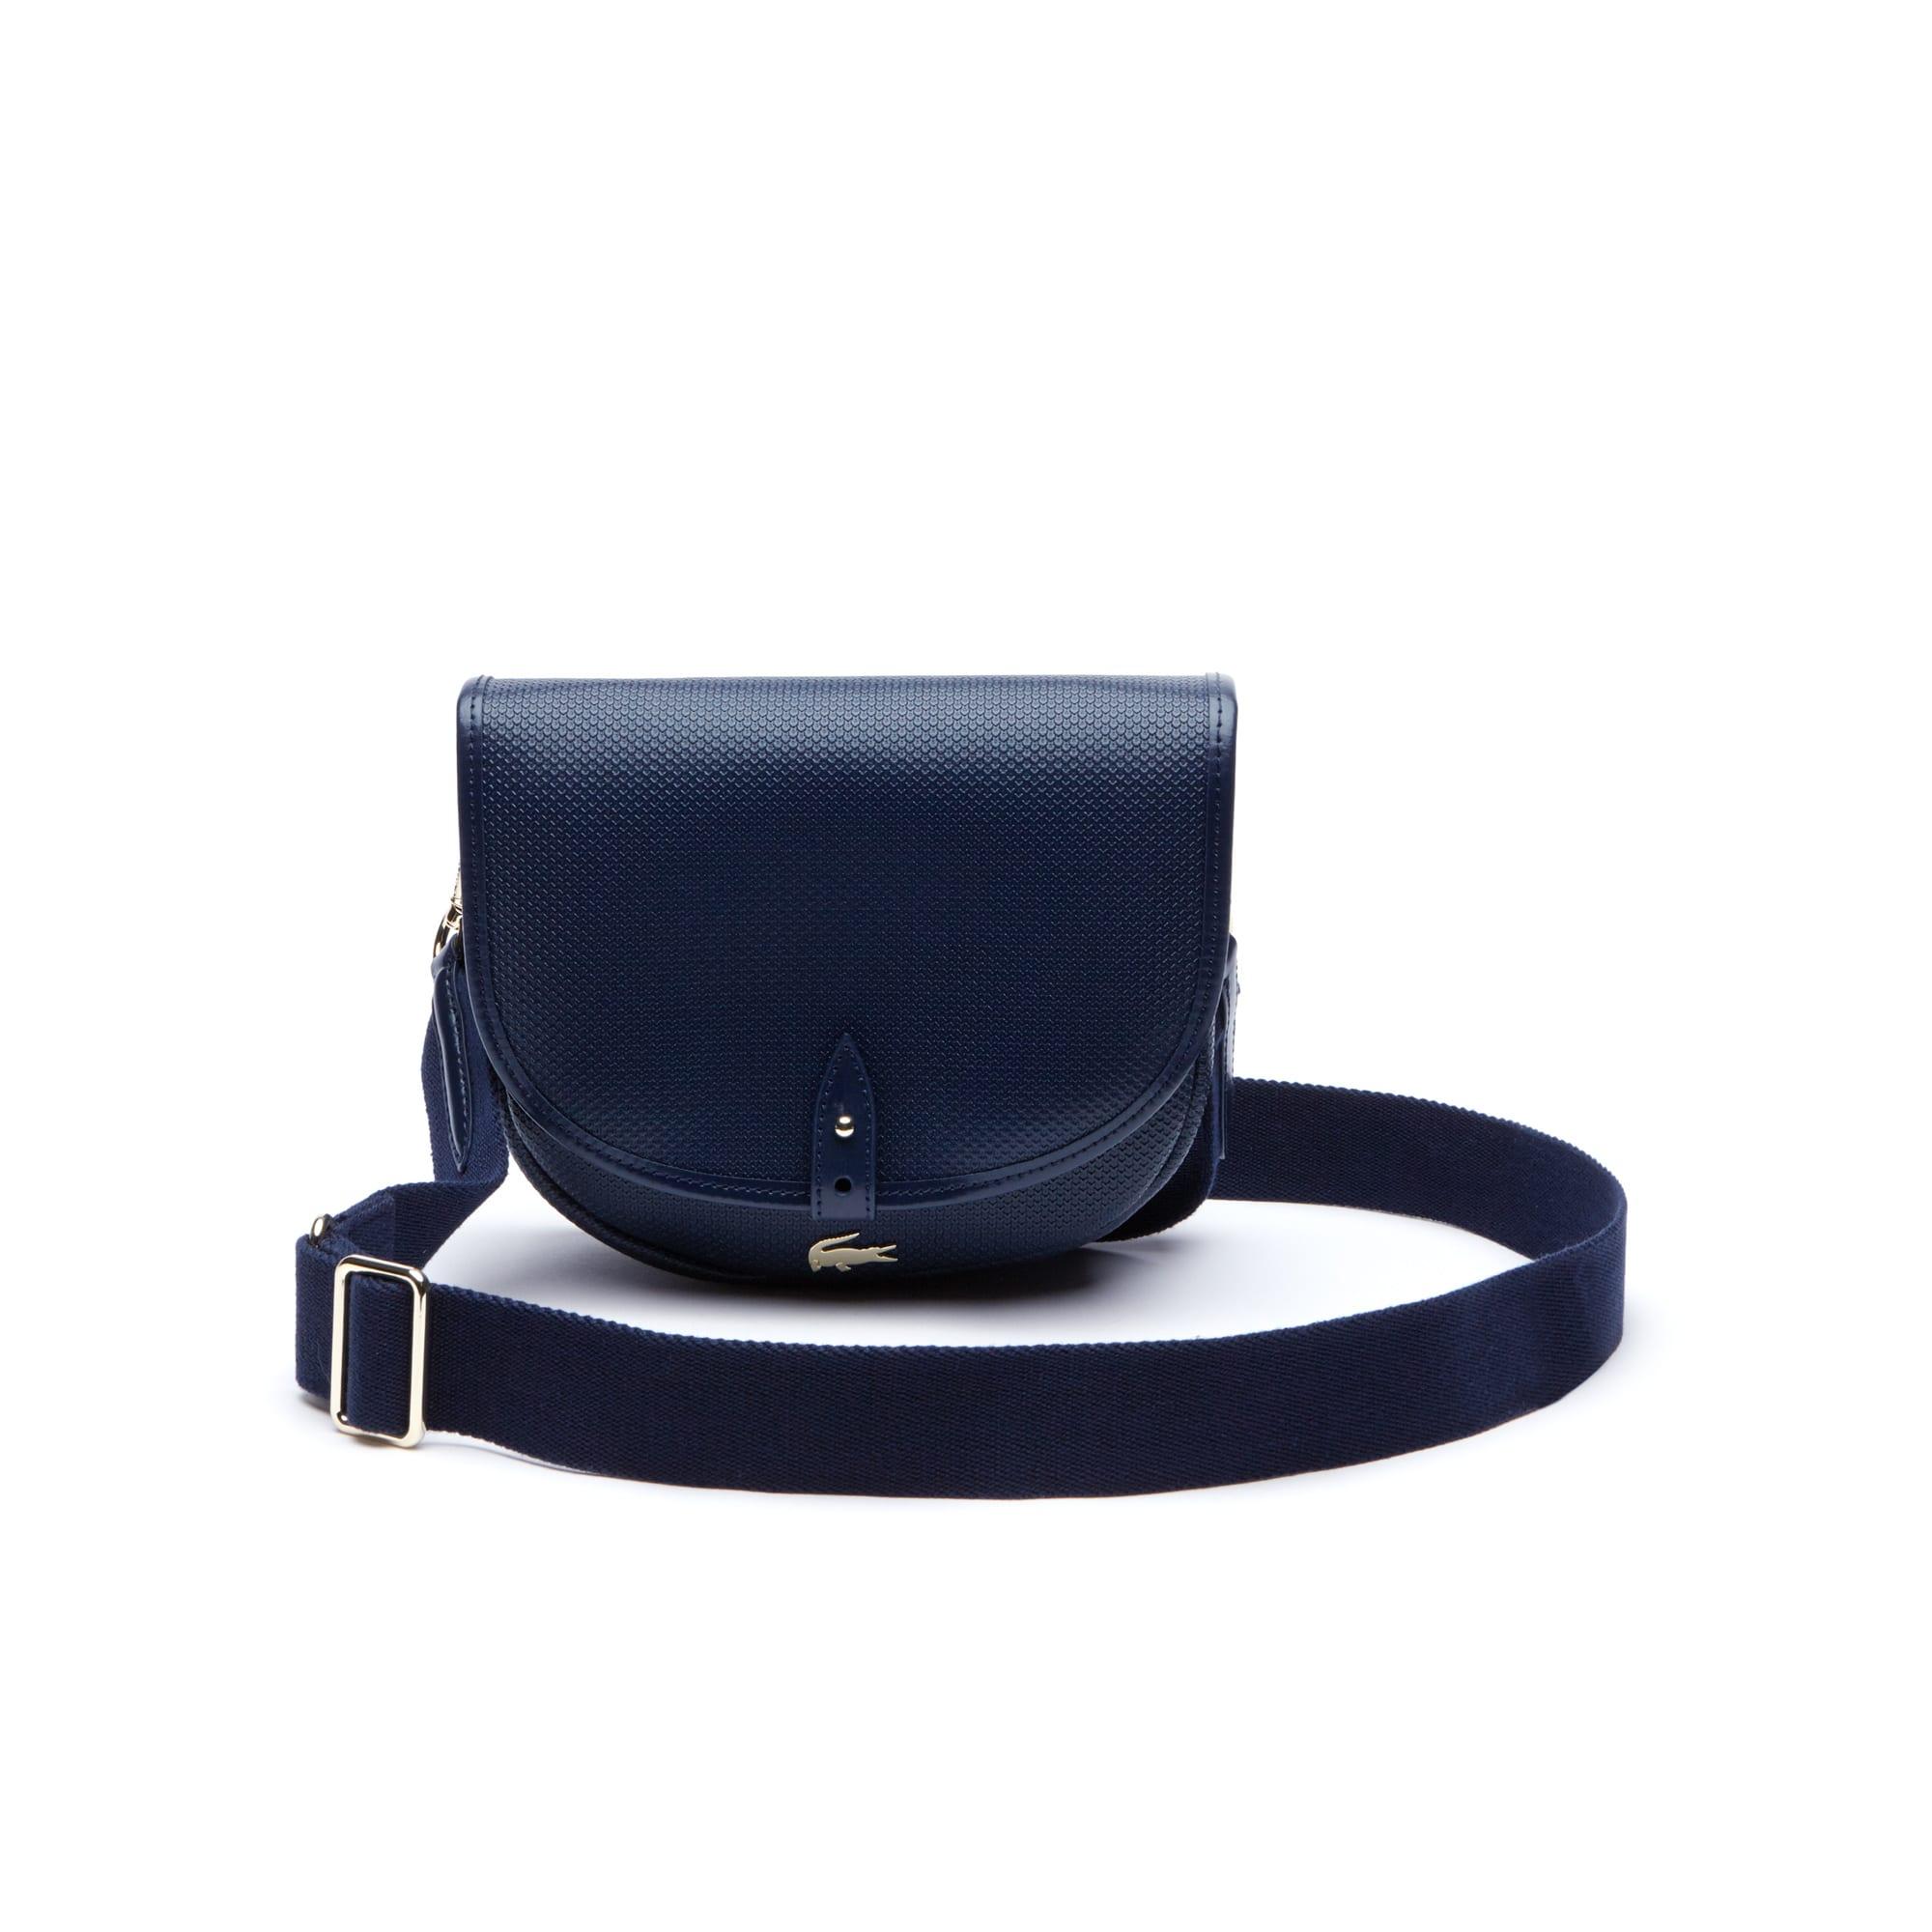 Women's Chantaco Piqué Leather Flap Crossover Bag